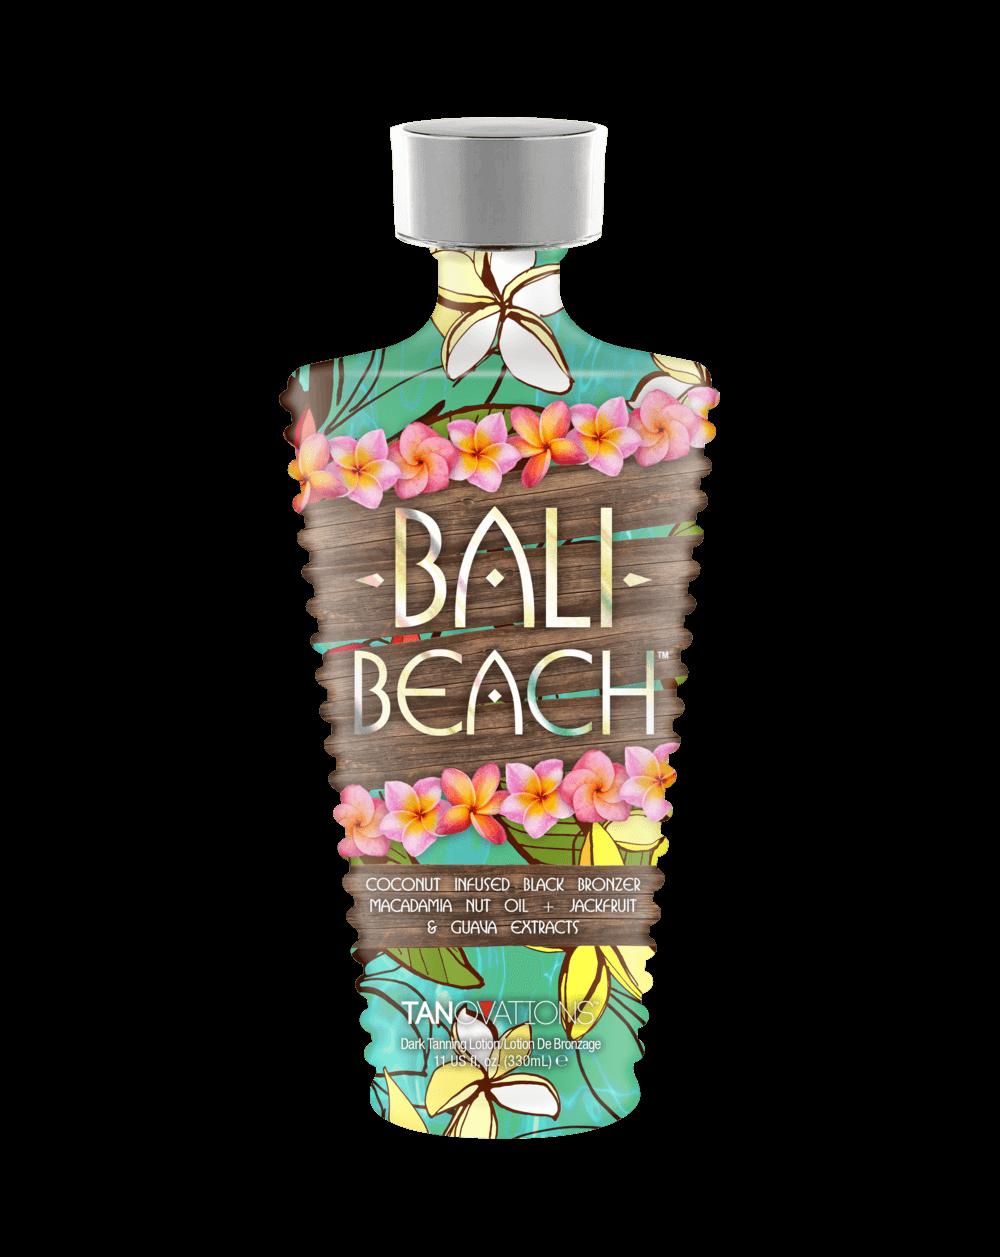 Bali Beach ™-Soliariumo kremai-TANOVATIONS kosmetika